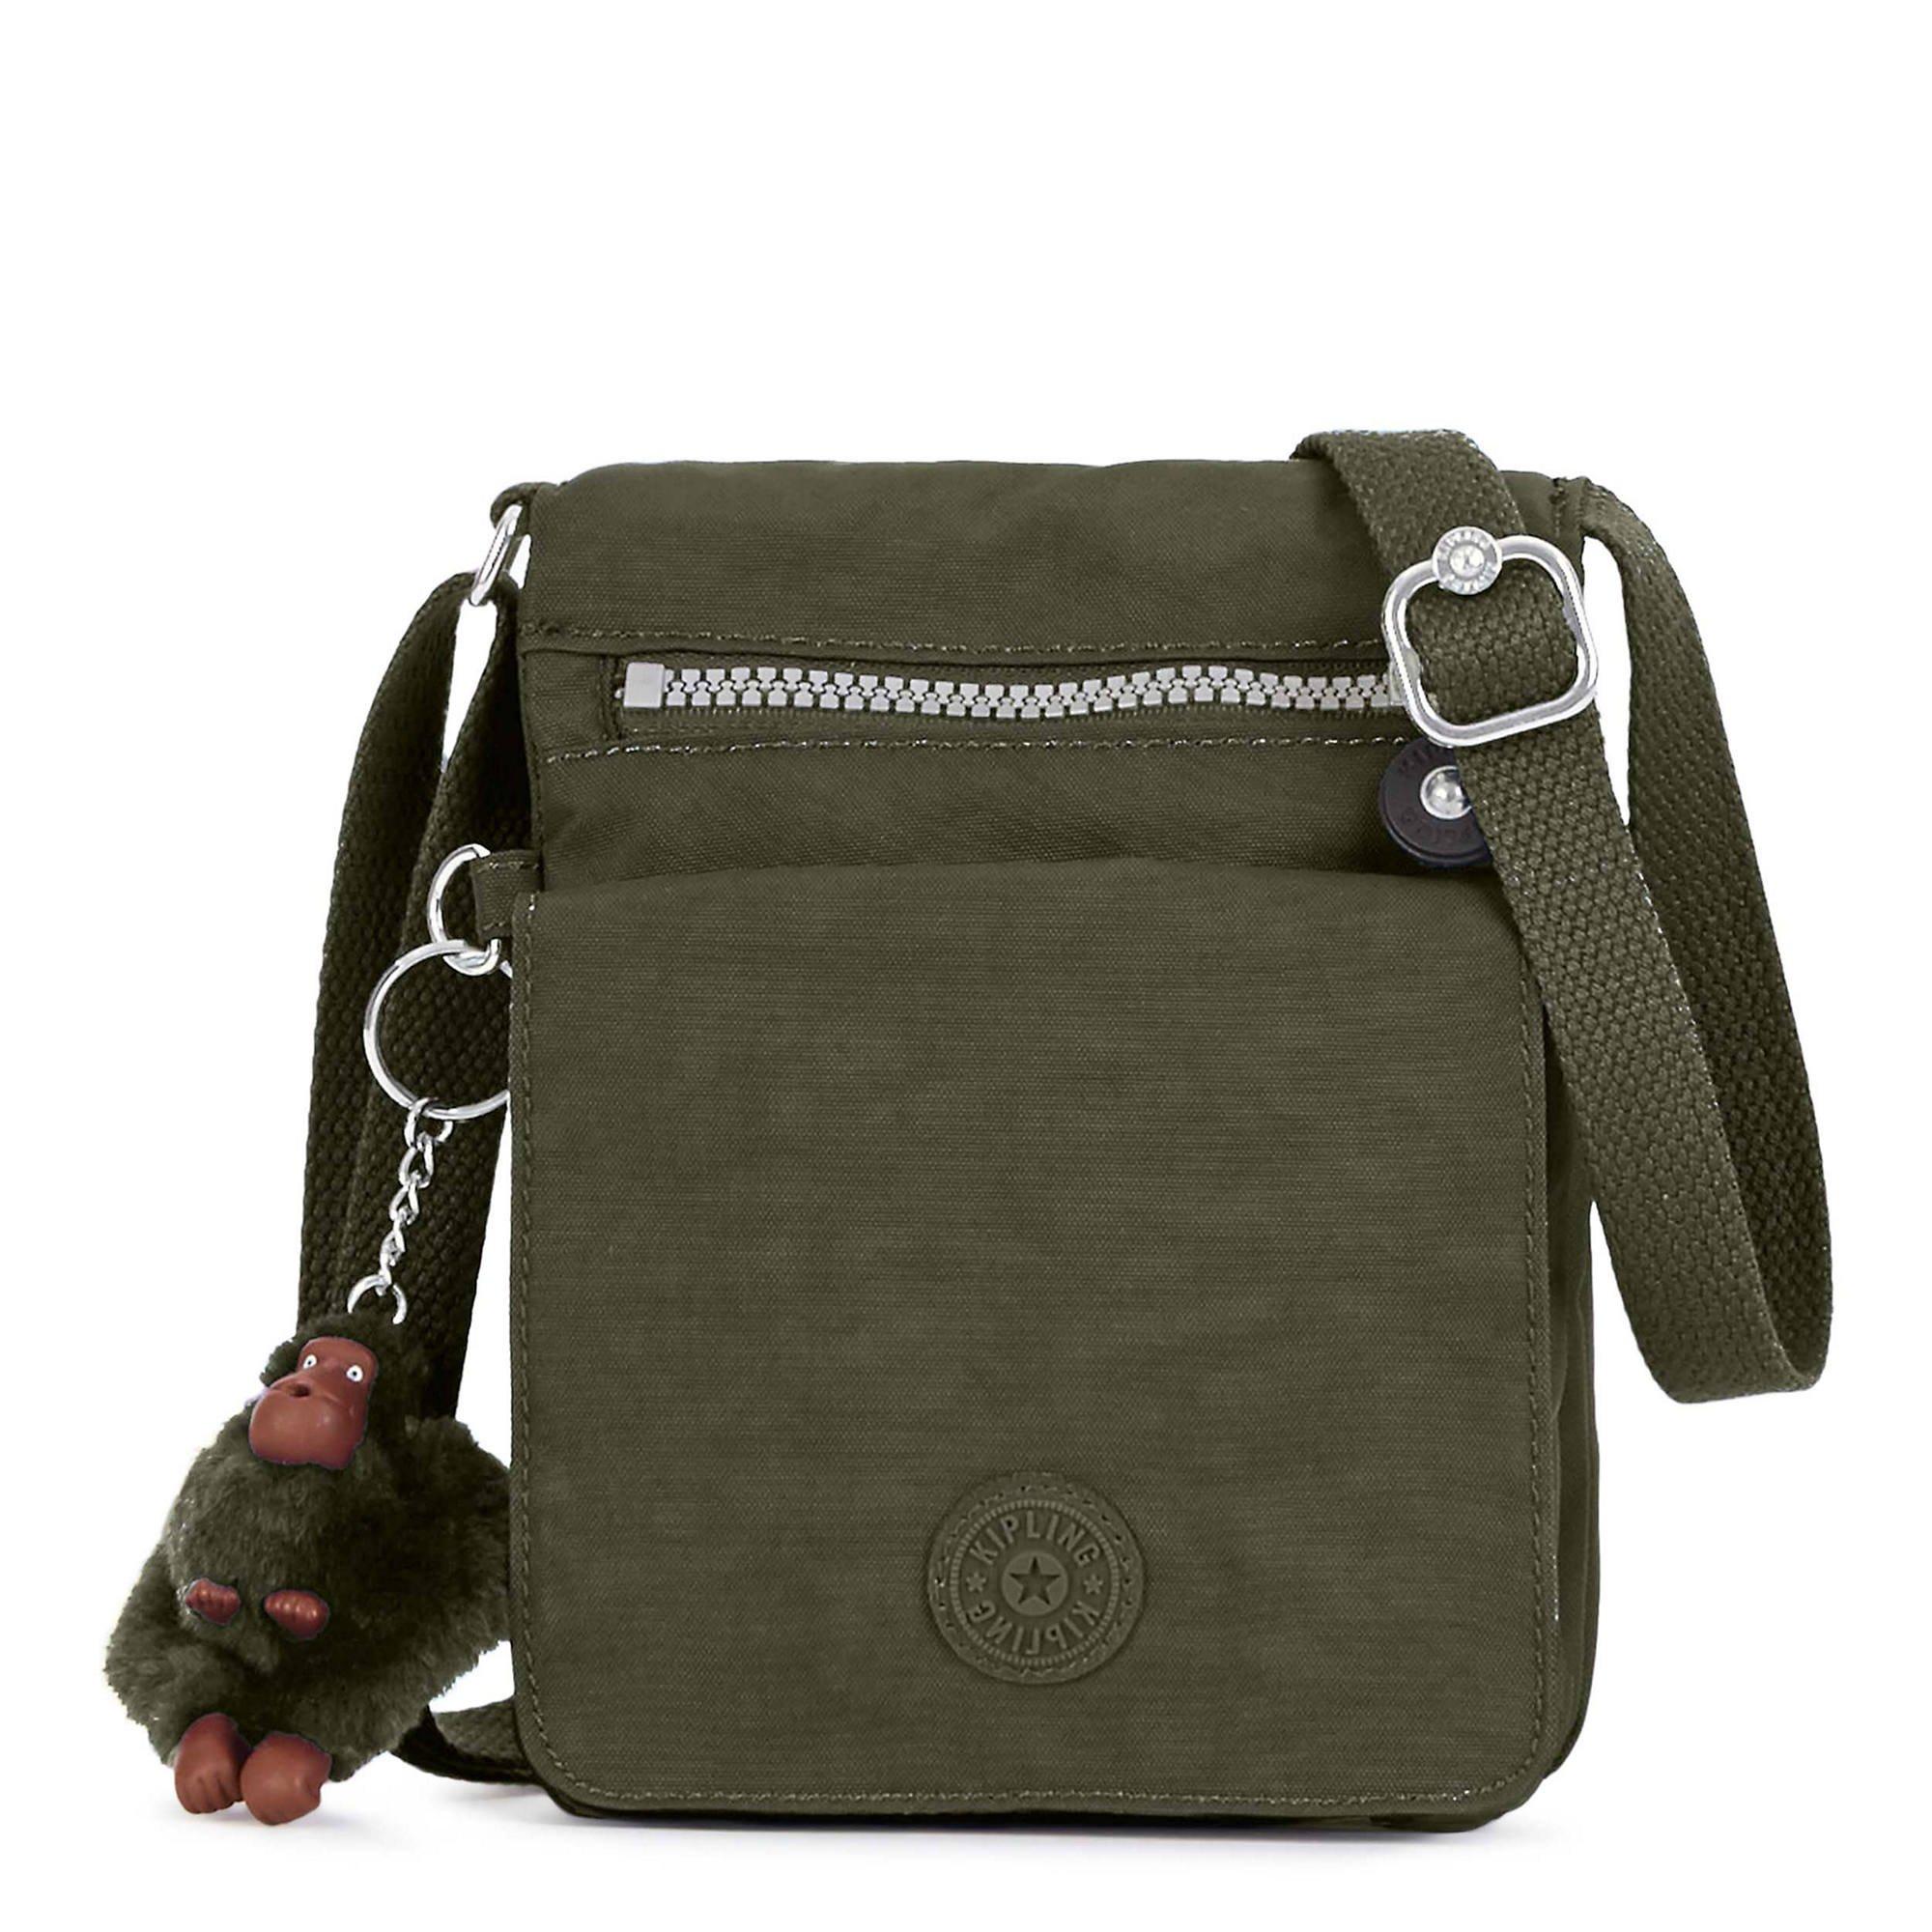 Kipling El Dorado Crossbody Bag, Essential Travel Accessory, Jaded Green